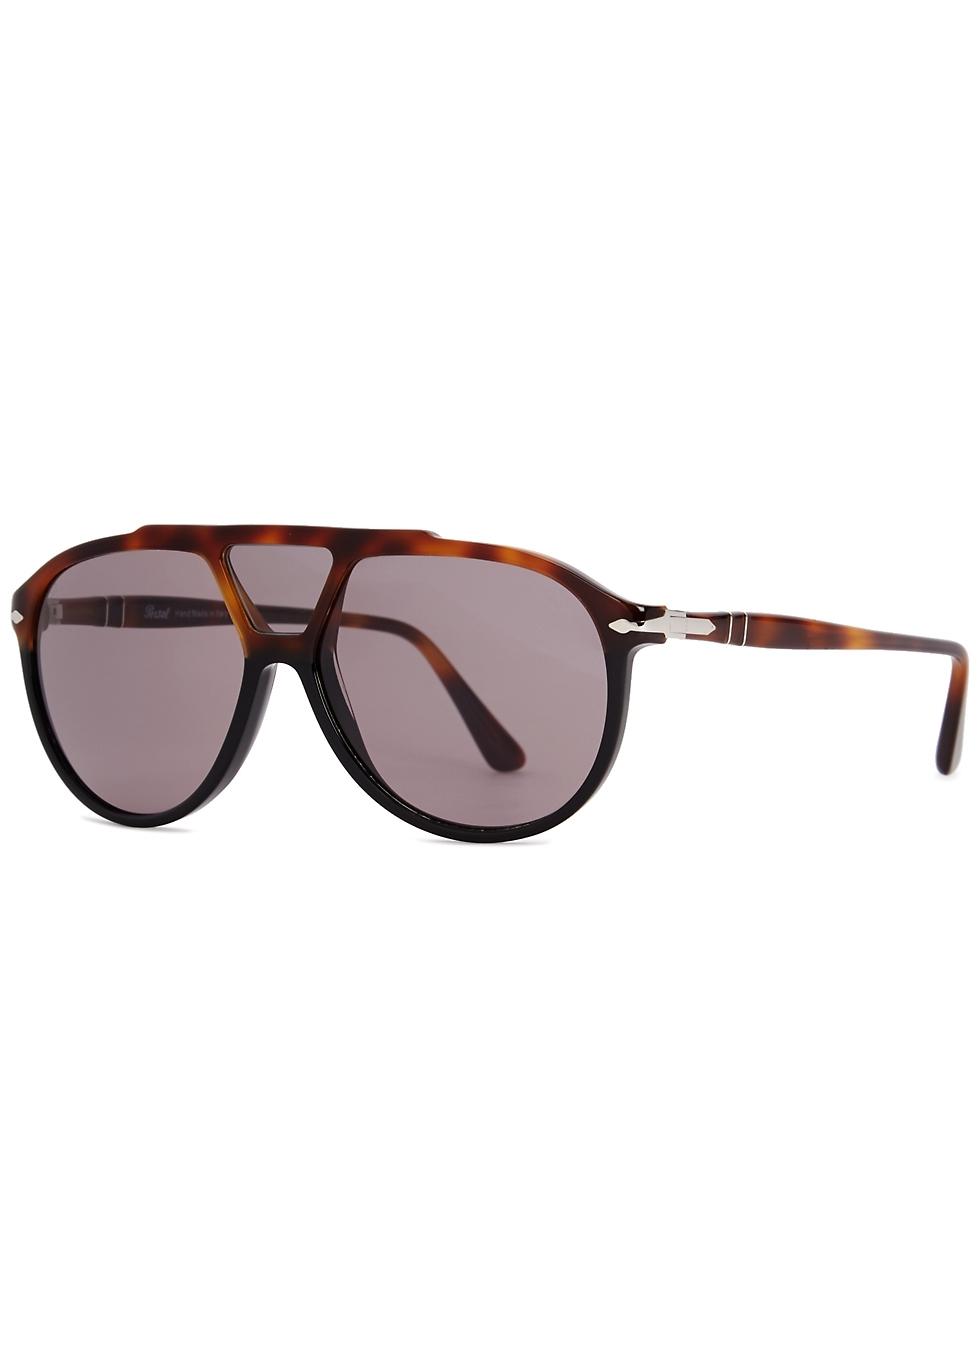 c6df3b4b88 Men s Designer Aviator Sunglasses - Harvey Nichols